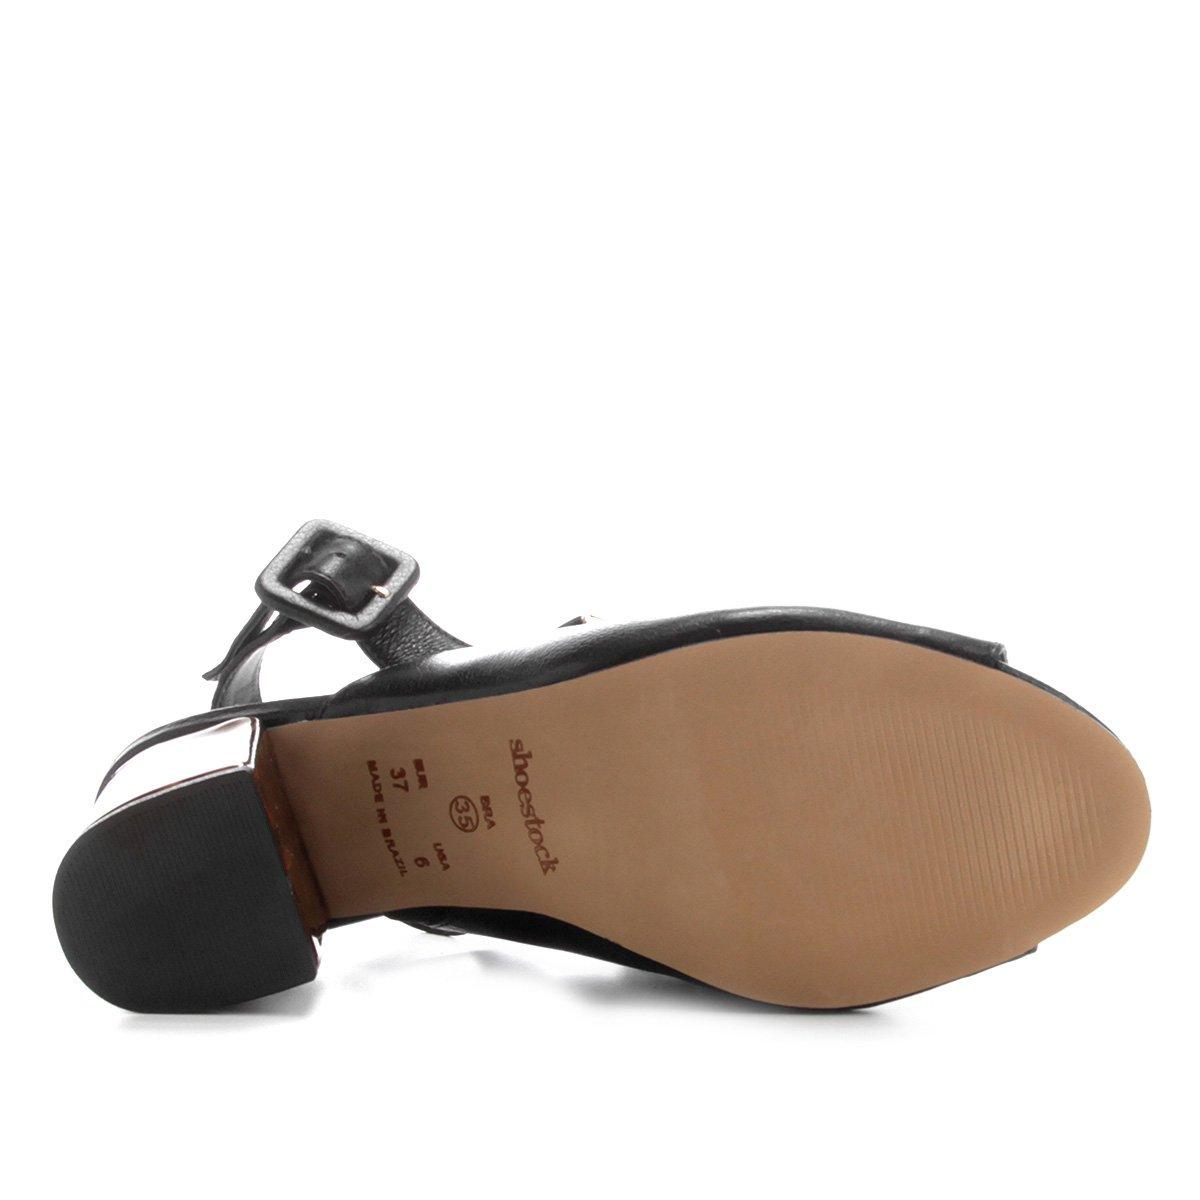 Grosso Shoestock Sandália Feminina Grosso Salto Tartaruga Preto Shoestock Sandália Salto Tartaruga Couro Couro Od6zAq6